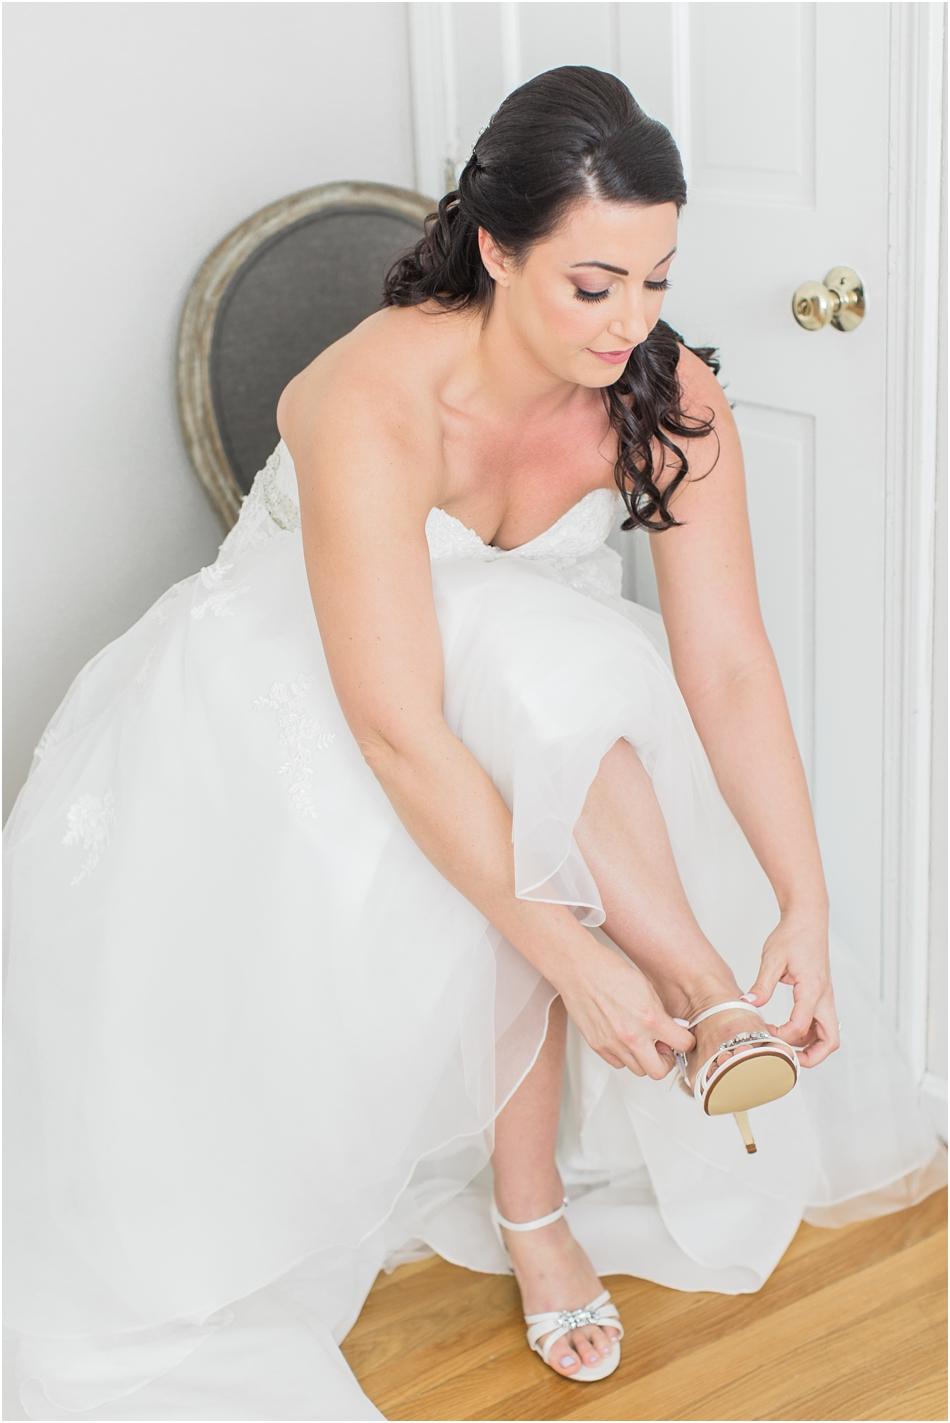 north_reading_lauren_sal_ballroom_cape_cod_boston_new_england_wedding_photographer_Meredith_Jane_Photography_photo_0103.jpg